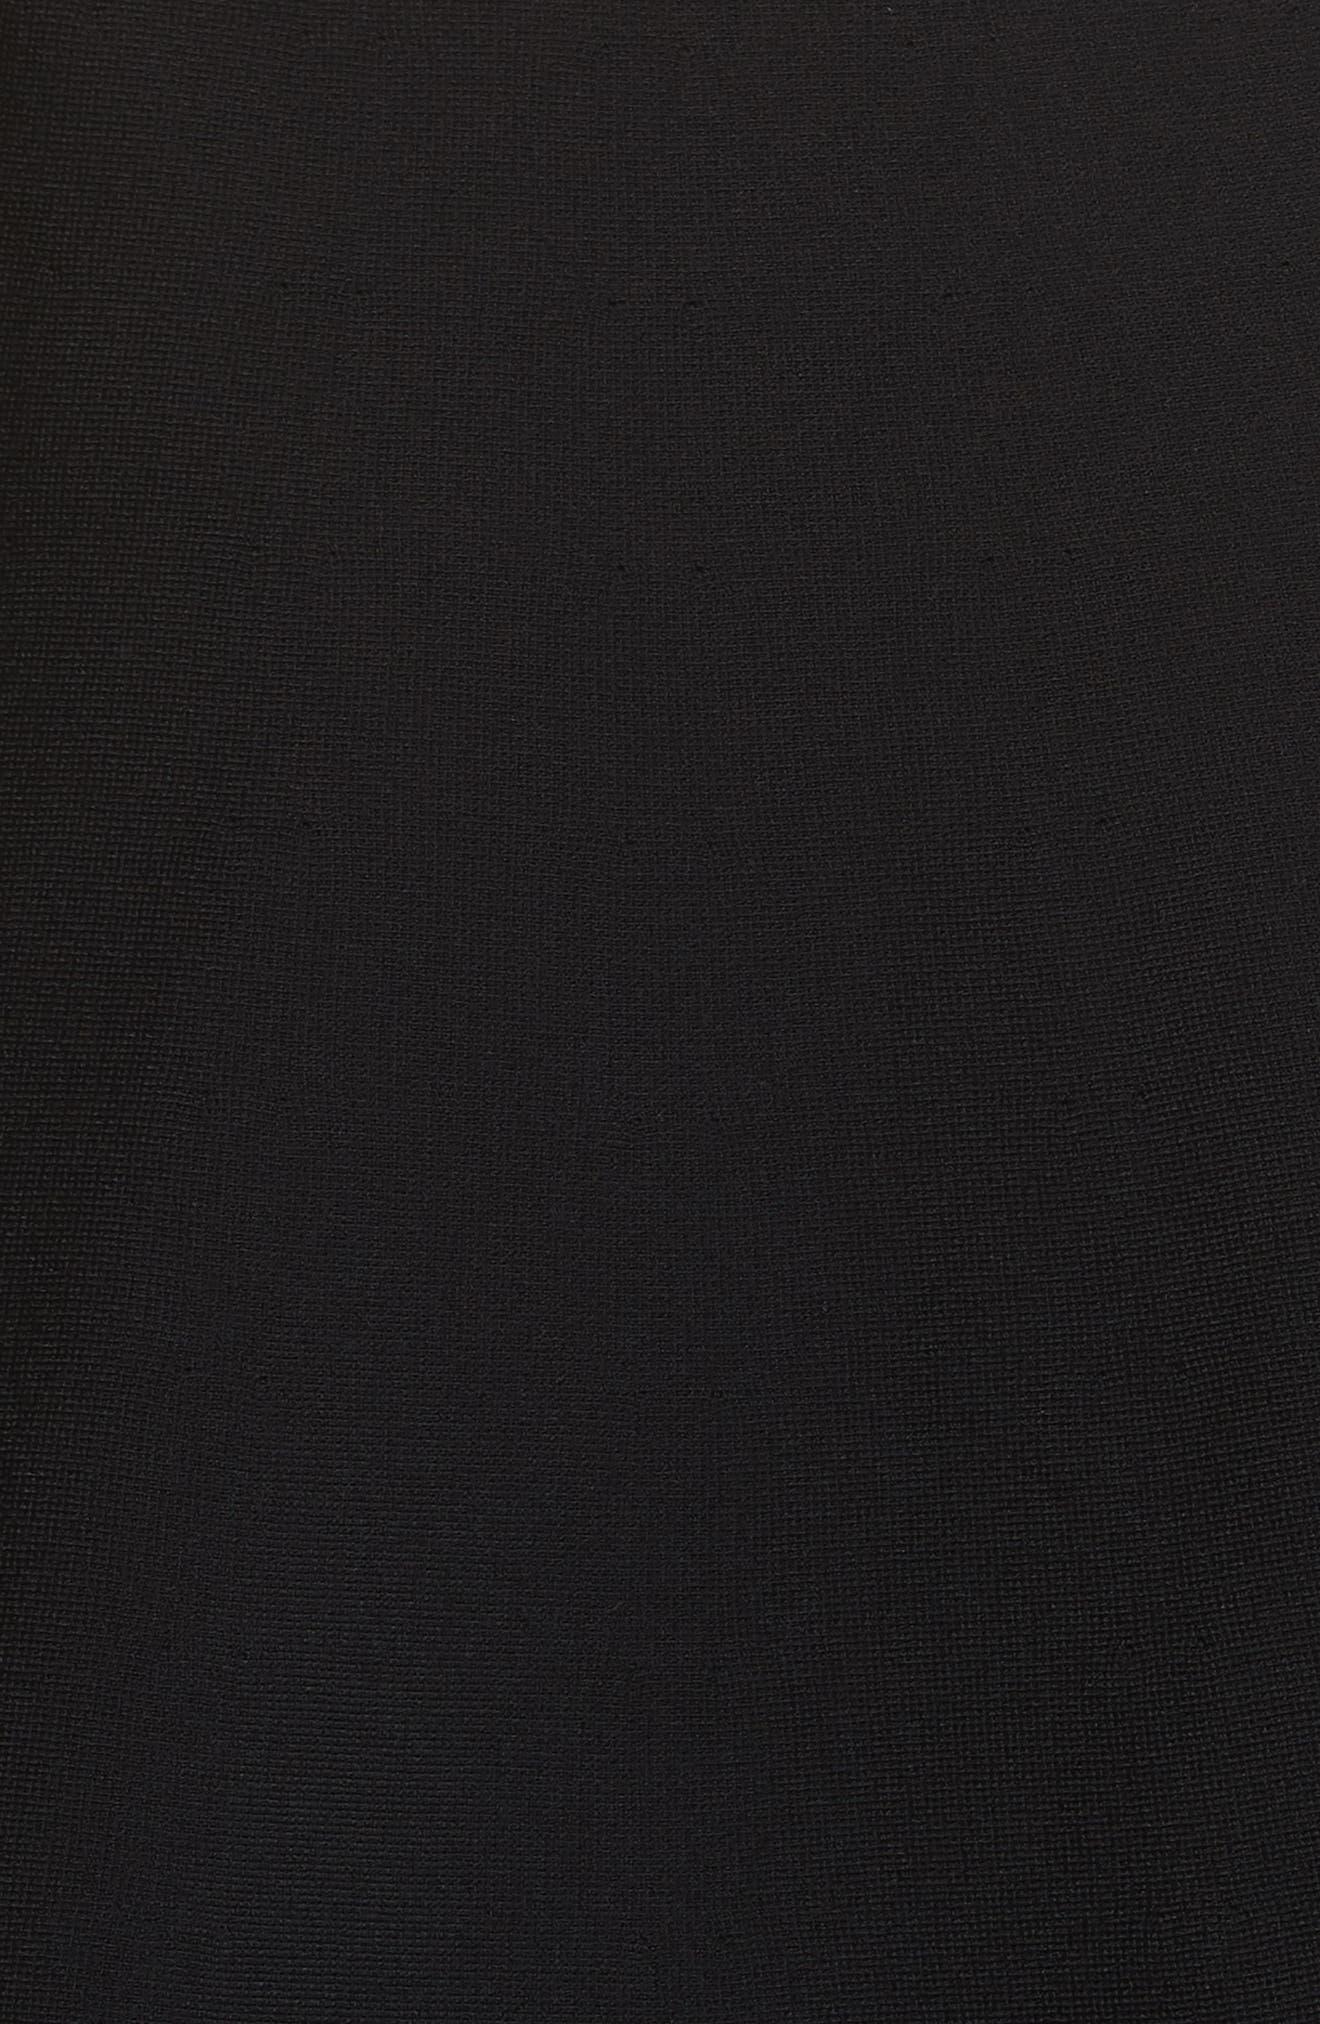 Lace Trim Tiered Sweater Dress,                             Alternate thumbnail 6, color,                             BLACK